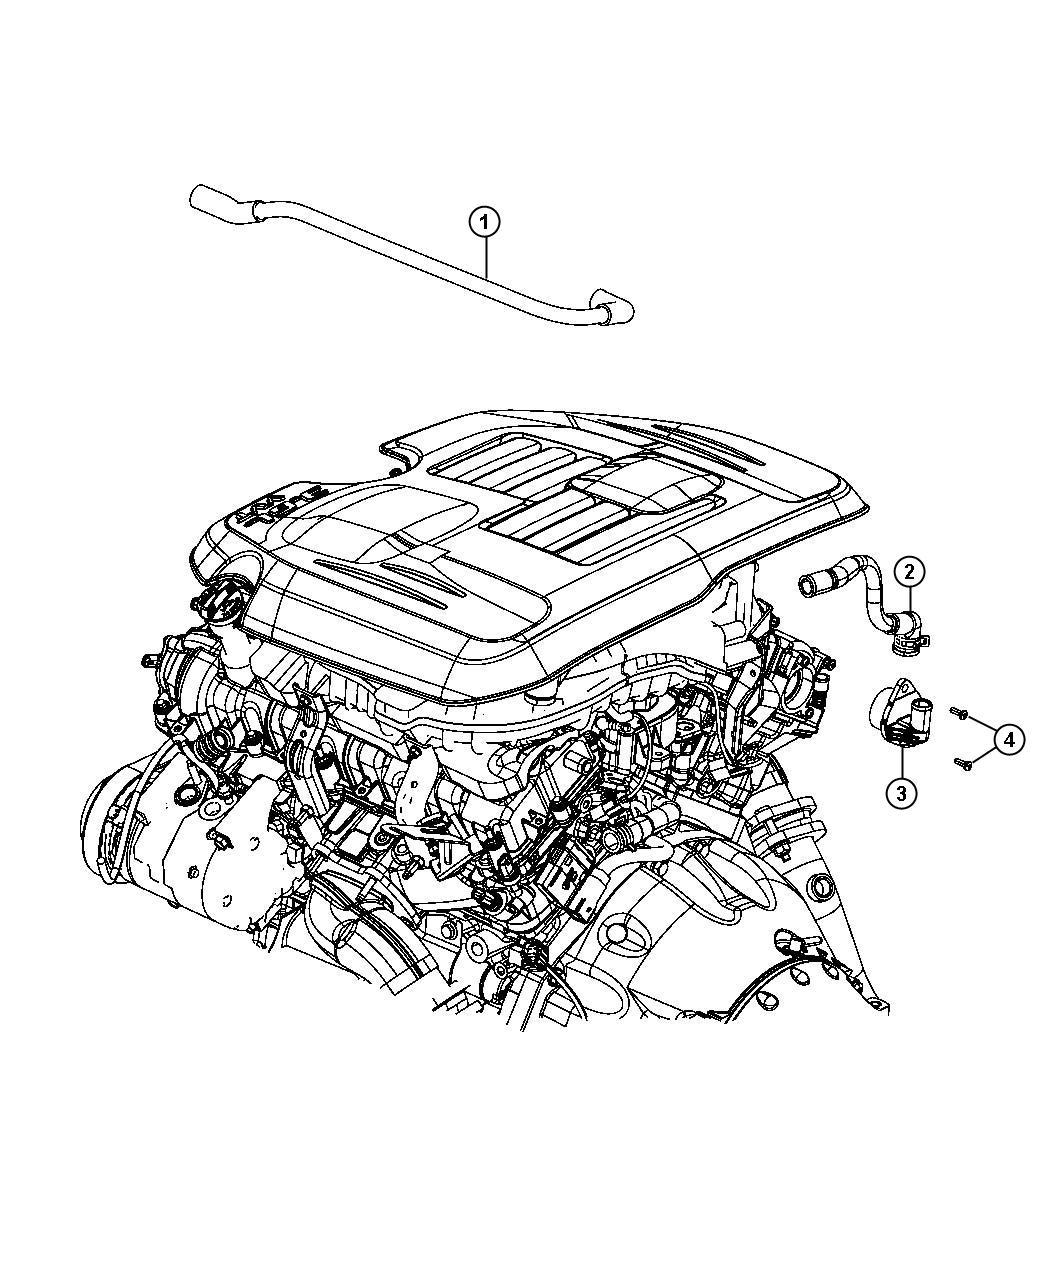 Dodge Charger Valve. Pcv. Engine, crankcase, ventilation